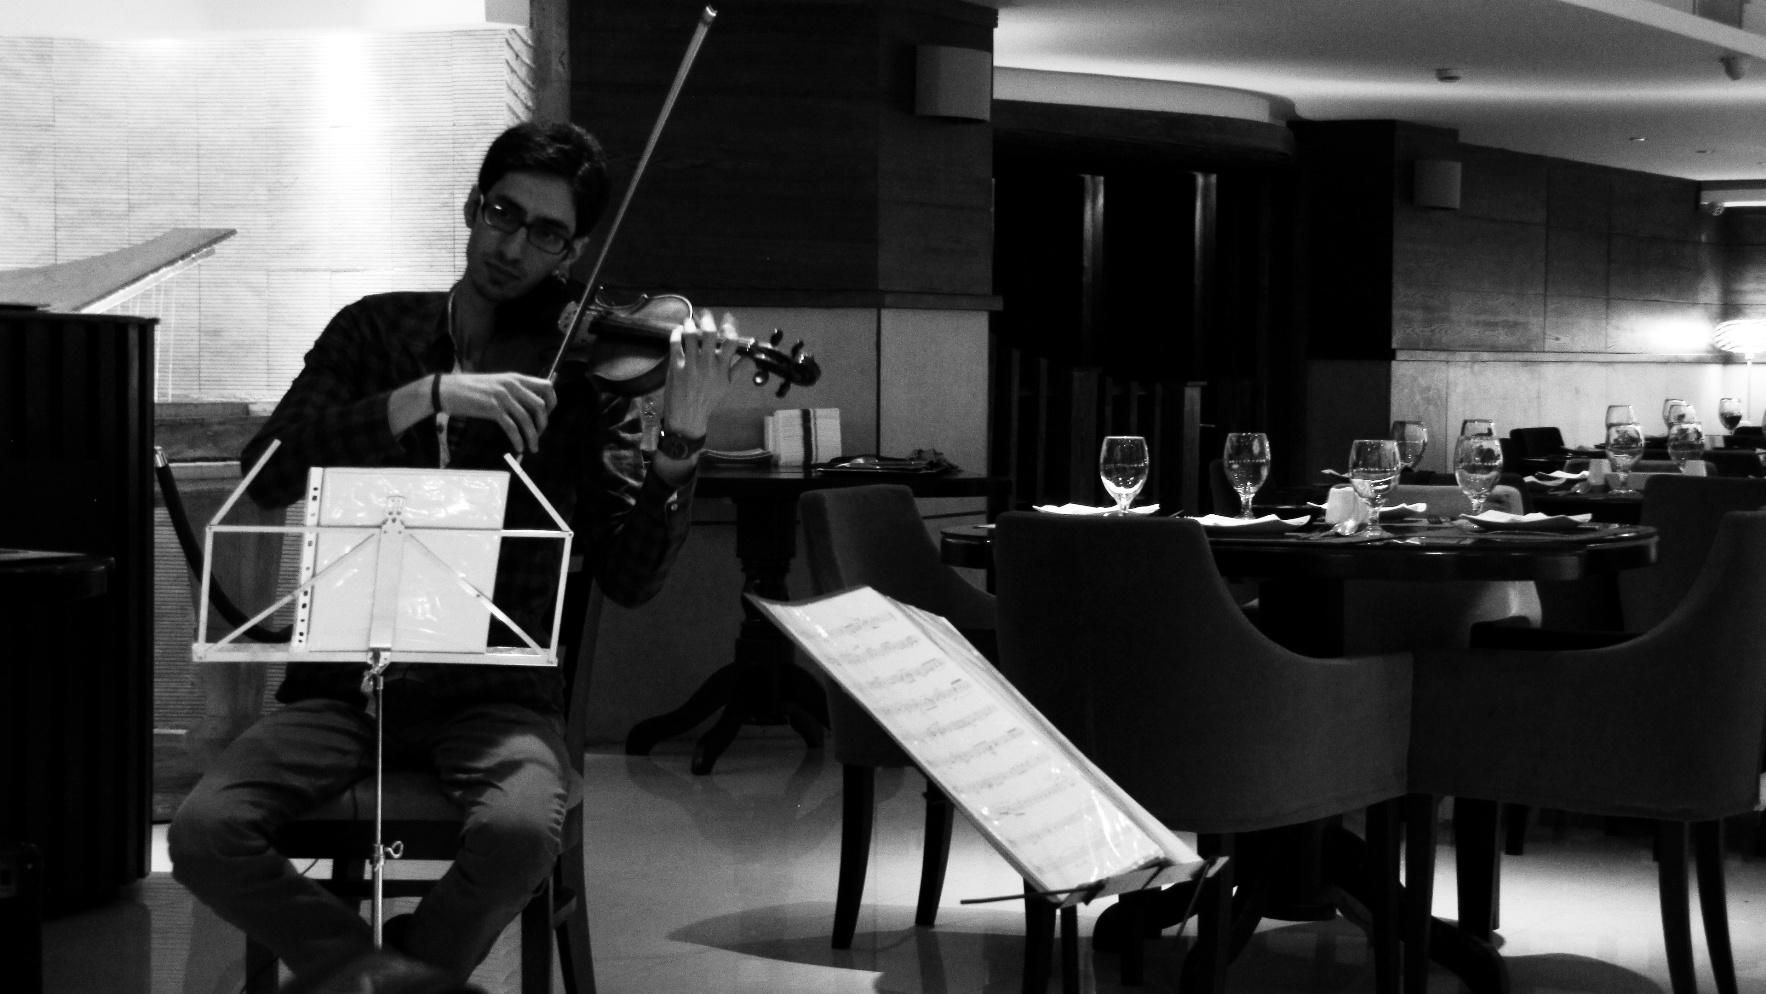 The Violinist | Soheil Shayesteh